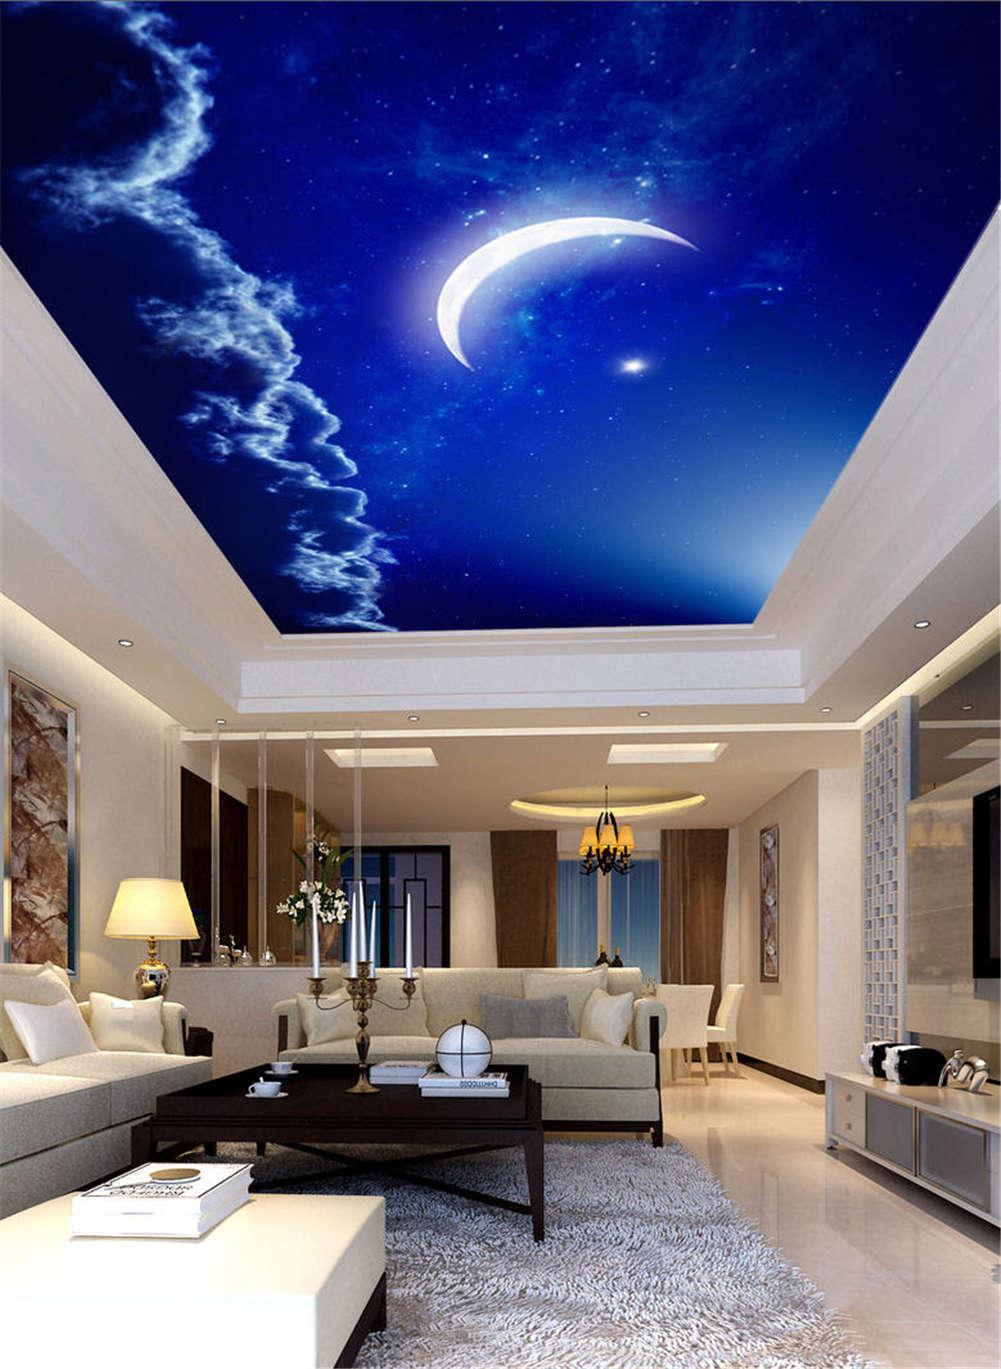 Pure Moonlit Night Full Wall Mural Photo Wallpaper Print 3D Ceiling Decor Home